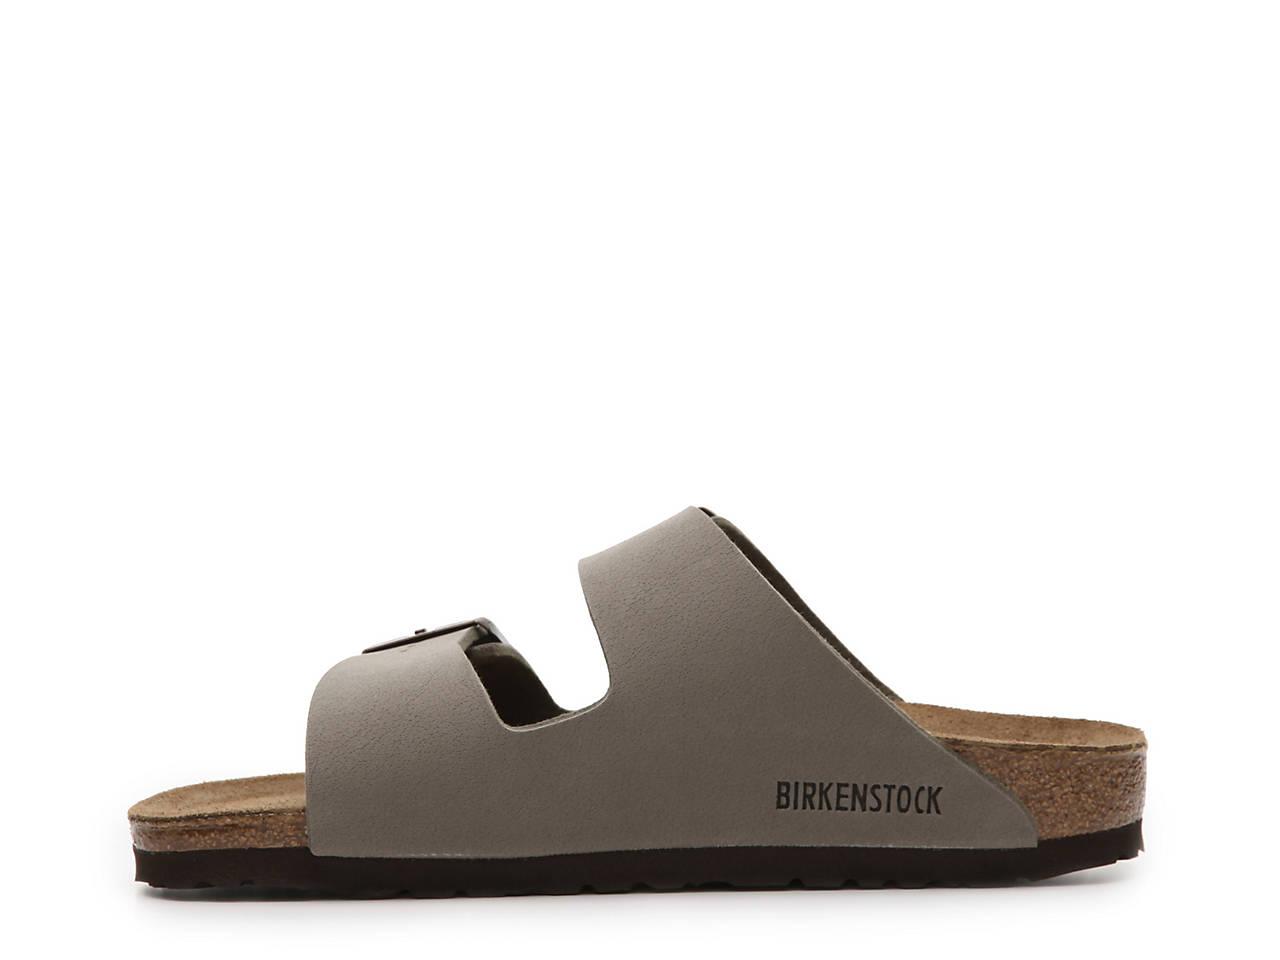 online retailer 9f926 35d8a Arizona Slide Sandal - Women's